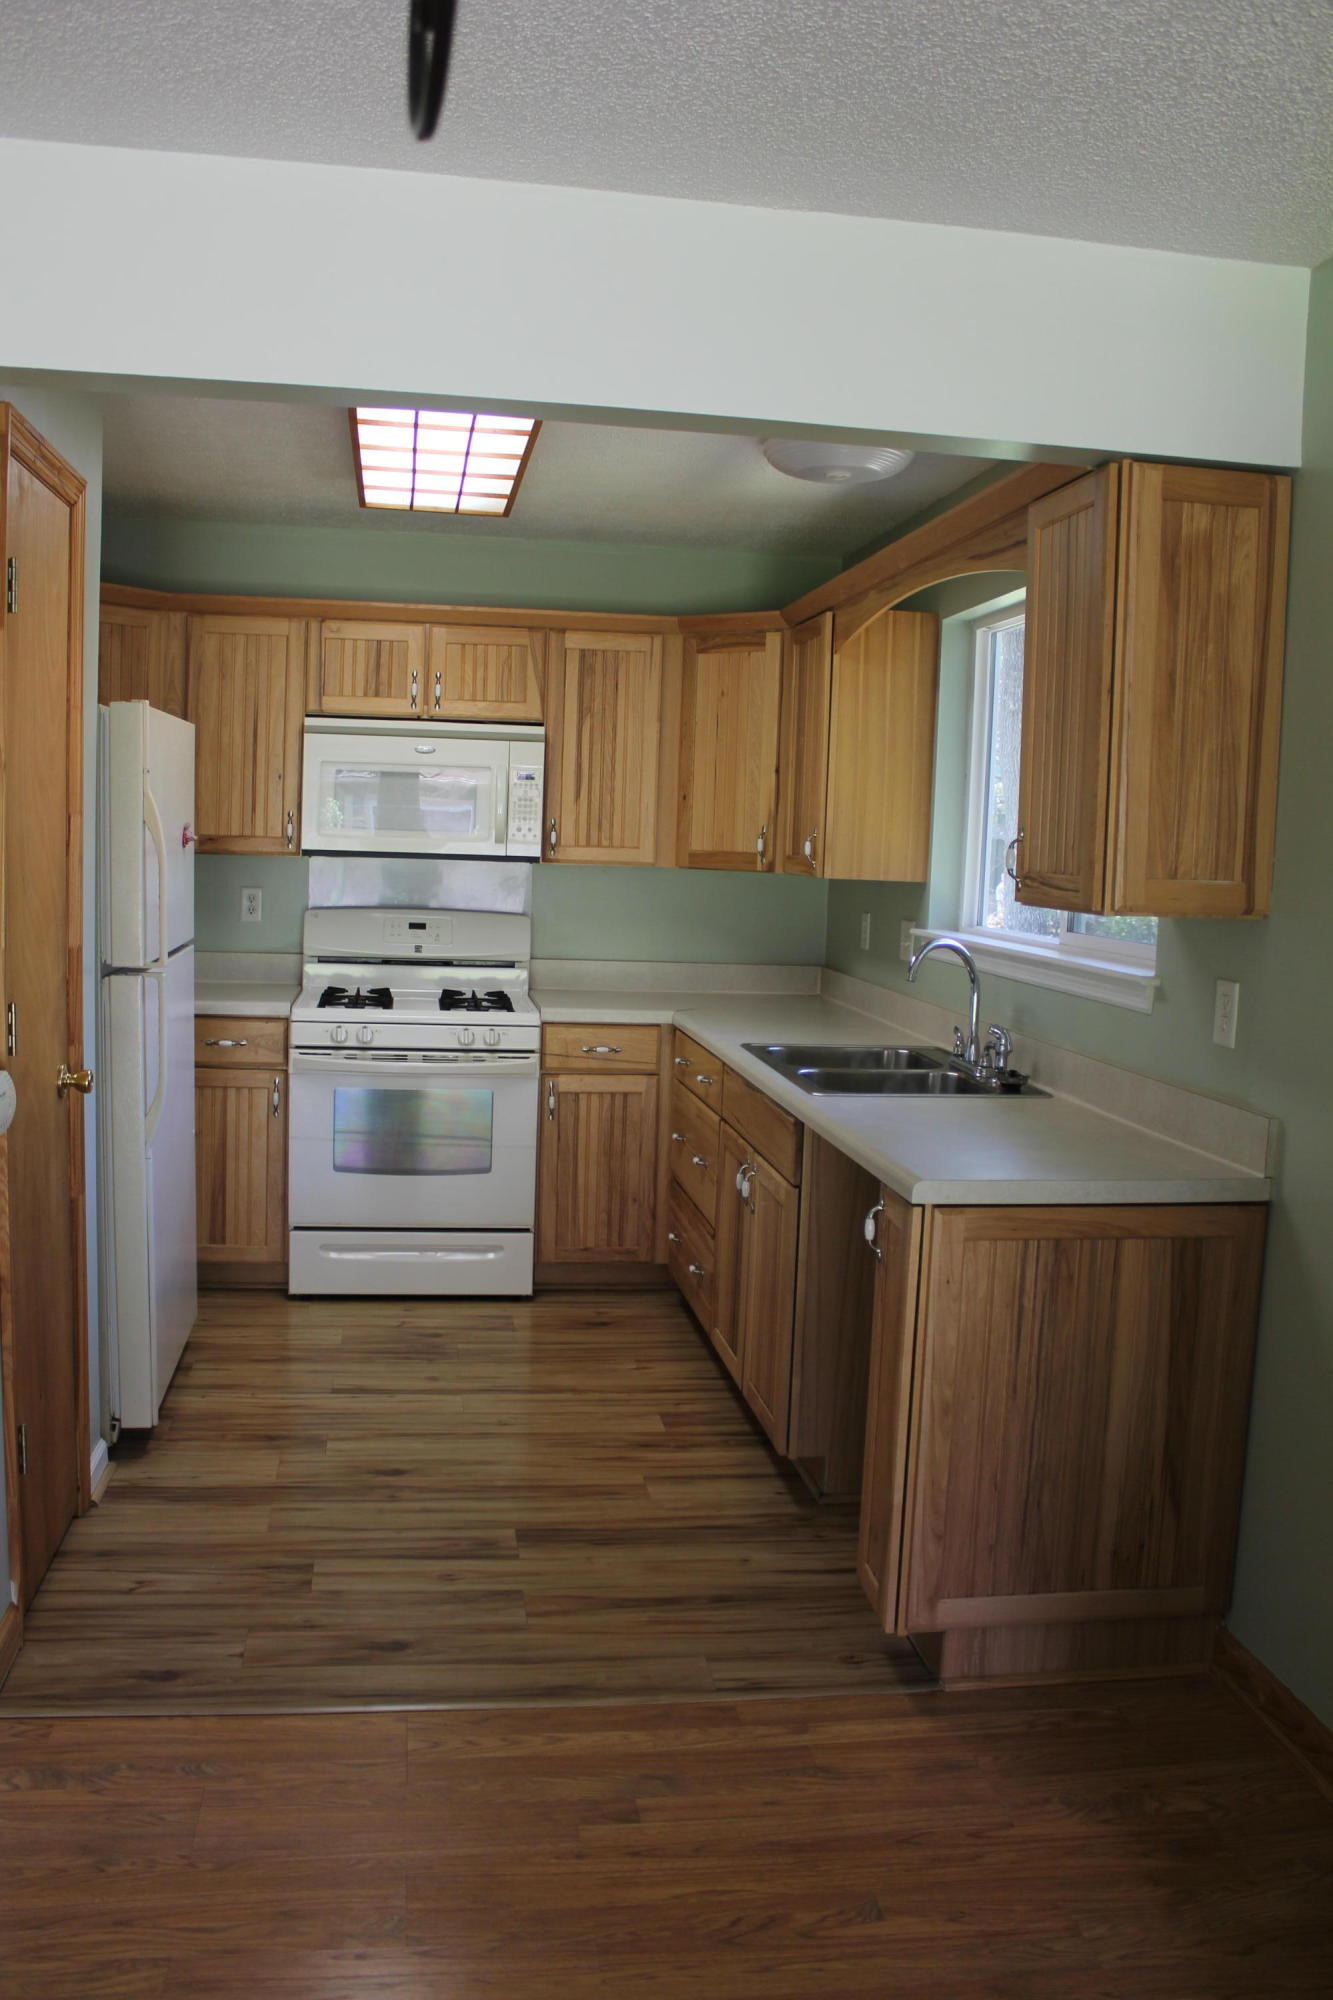 Ashleytowne Landing Homes For Sale - 2726 Jobee, Charleston, SC - 18